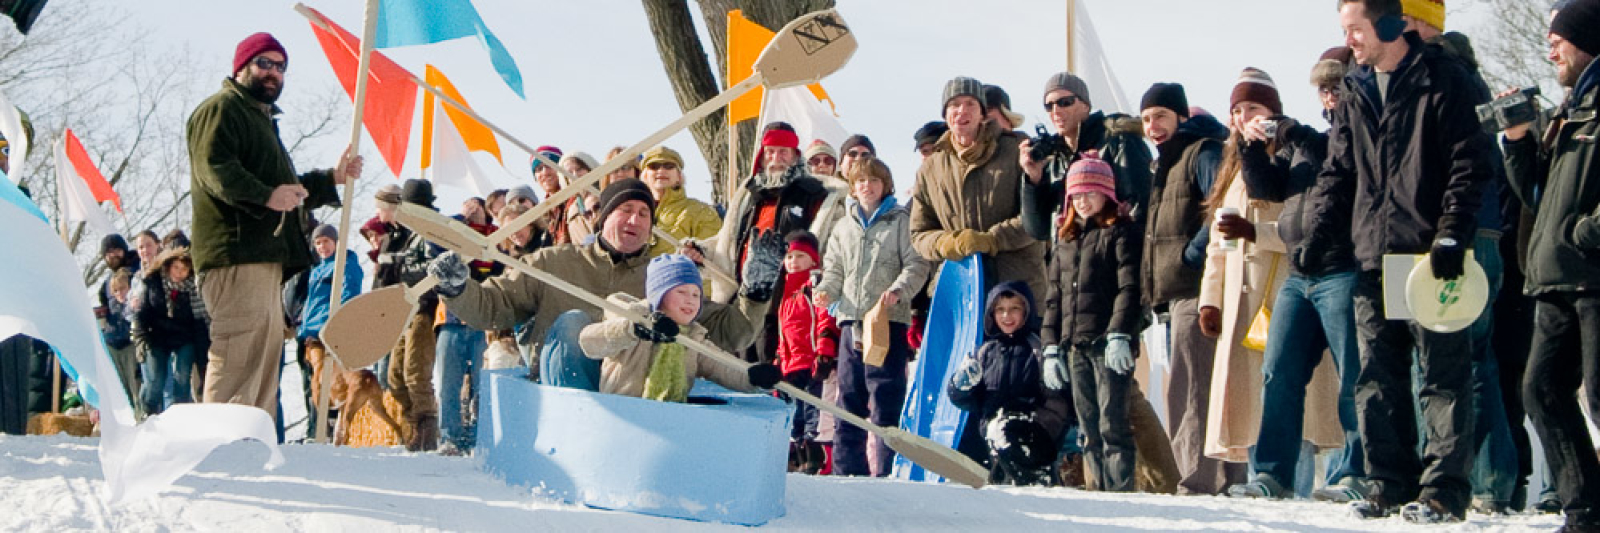 art-sled-rally-08-4335